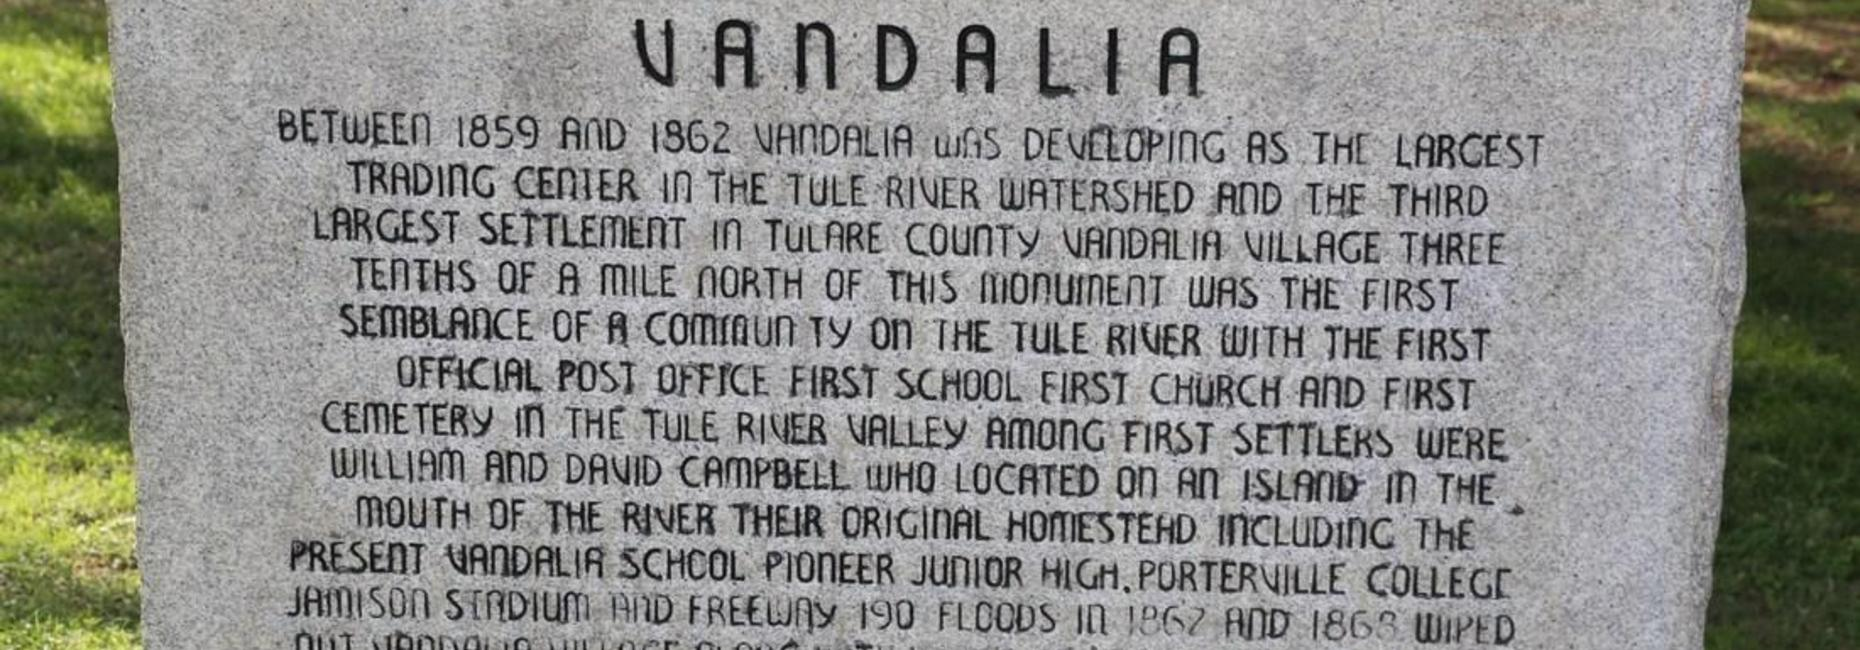 Vandalia stone